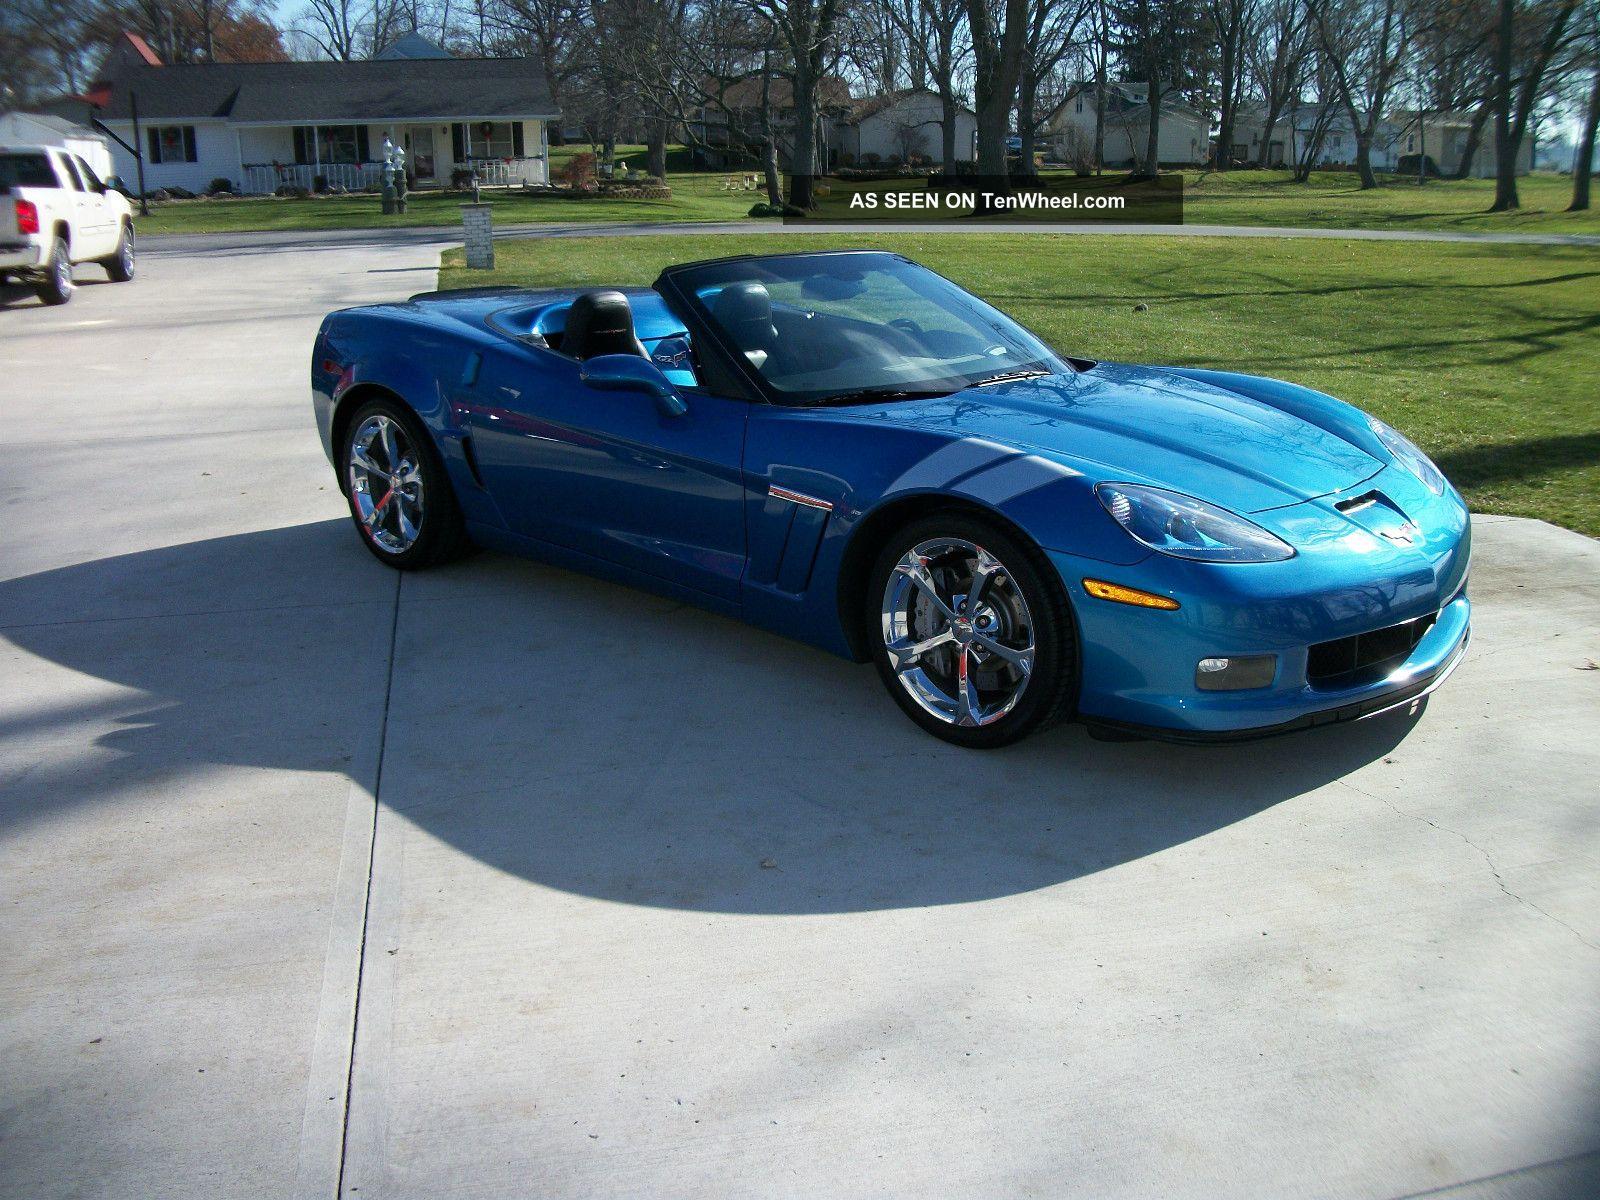 2011 corvette grand sport convertible 4lt. Black Bedroom Furniture Sets. Home Design Ideas